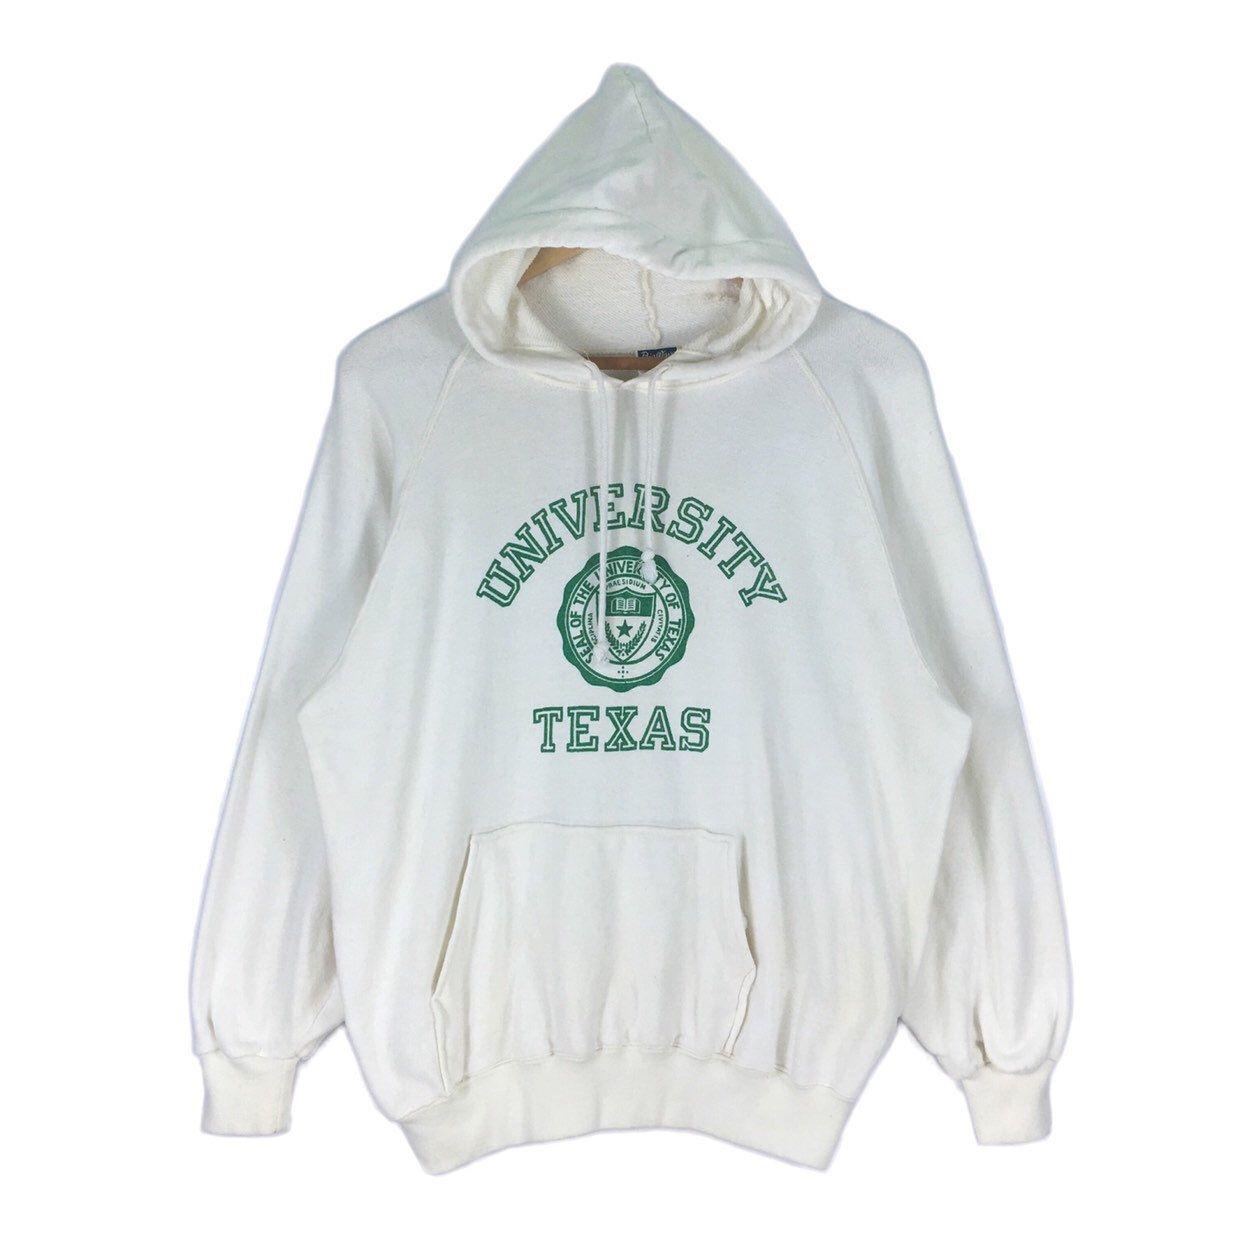 Vintage 90s University Of Texas Austin Sweatshirt Hoodie Made Etsy Sweatshirts Hoodie Sweatshirts Hoodies [ 1242 x 1242 Pixel ]